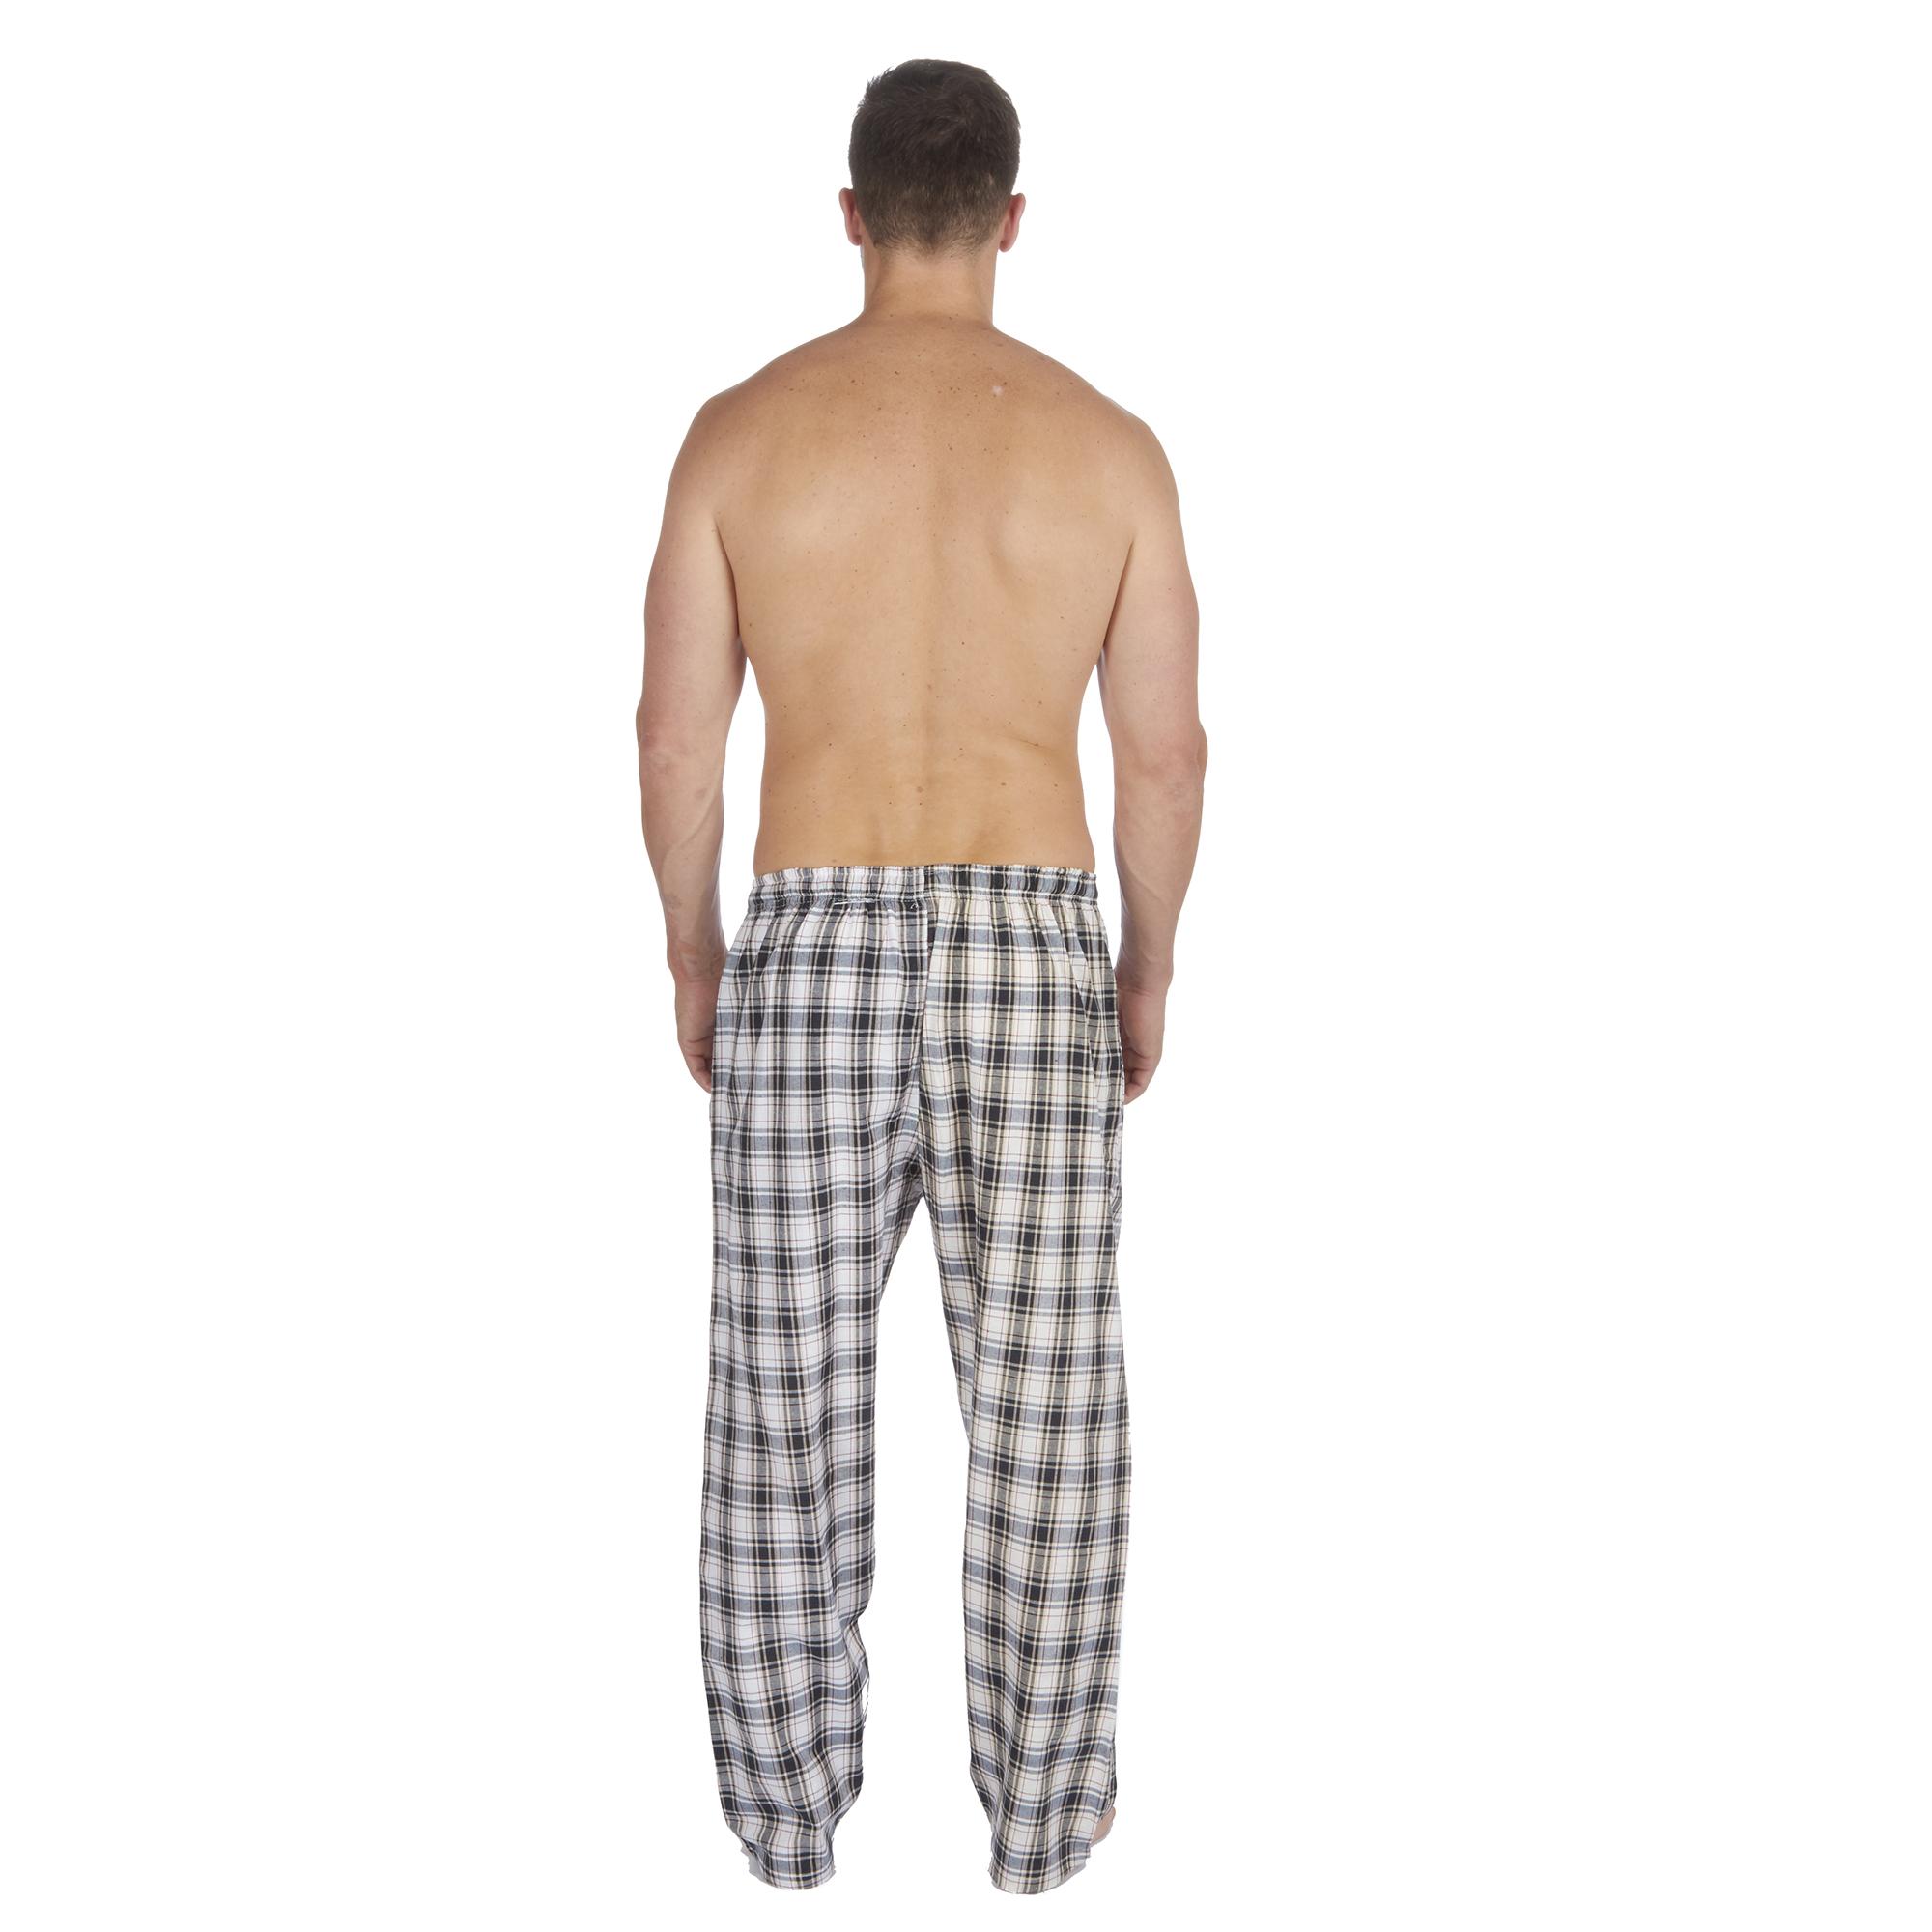 Jason-Jones-Homme-Carreaux-Tisse-Pyjama-Pantalon-en-Coton-Melange-Serge-PJ-Lounge-Pants miniature 9